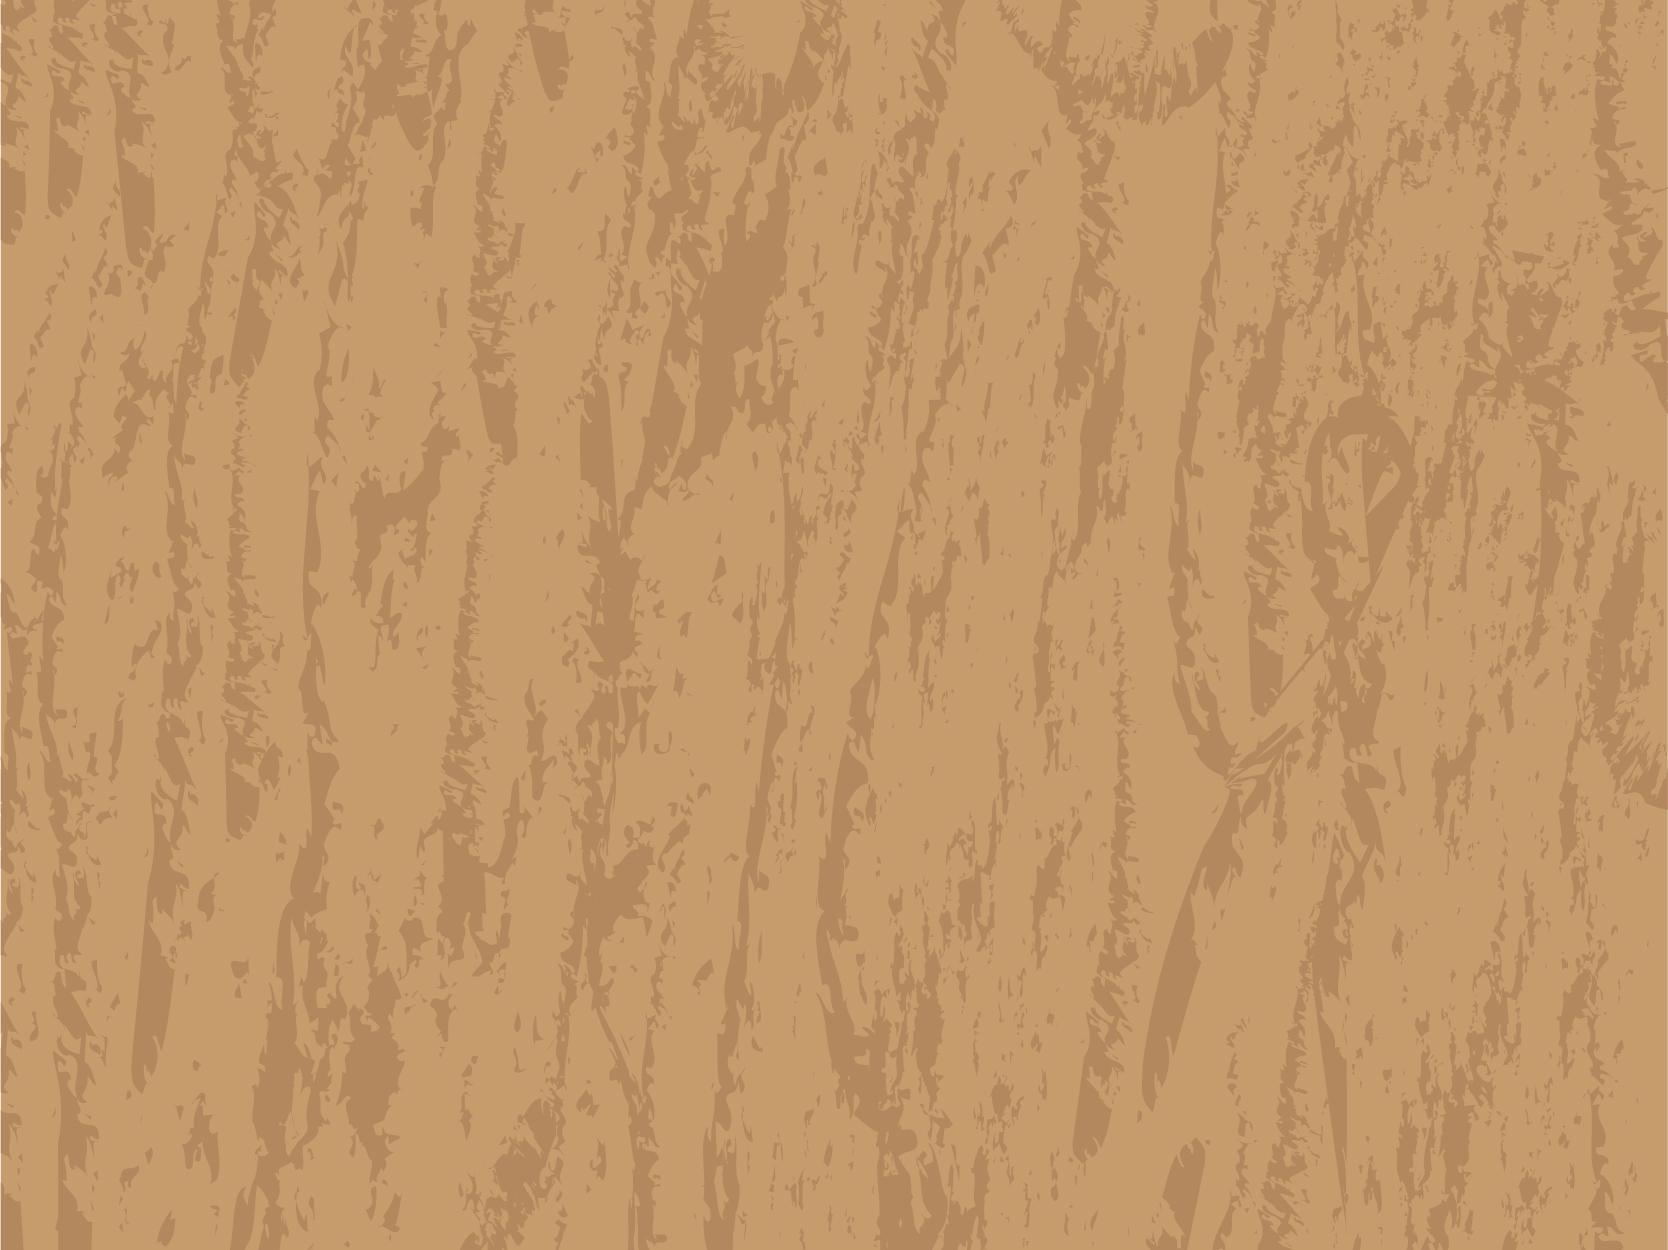 Wood Background Vectors